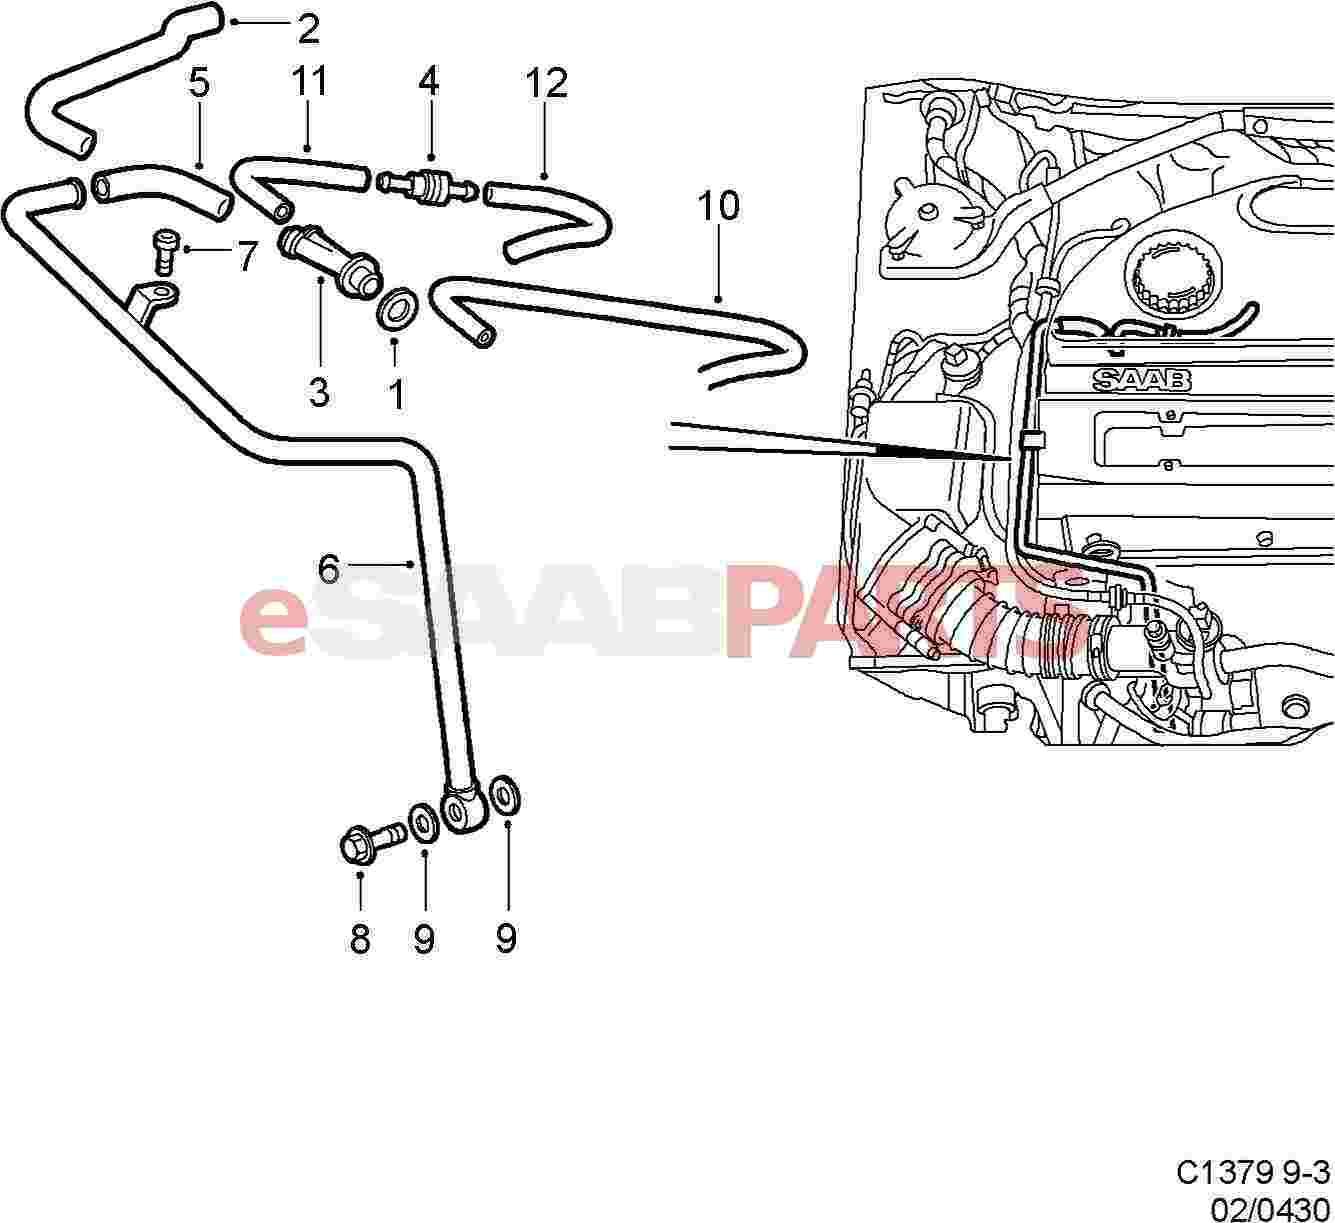 9189564  Saab Positive Crankcase Ventilation Valve